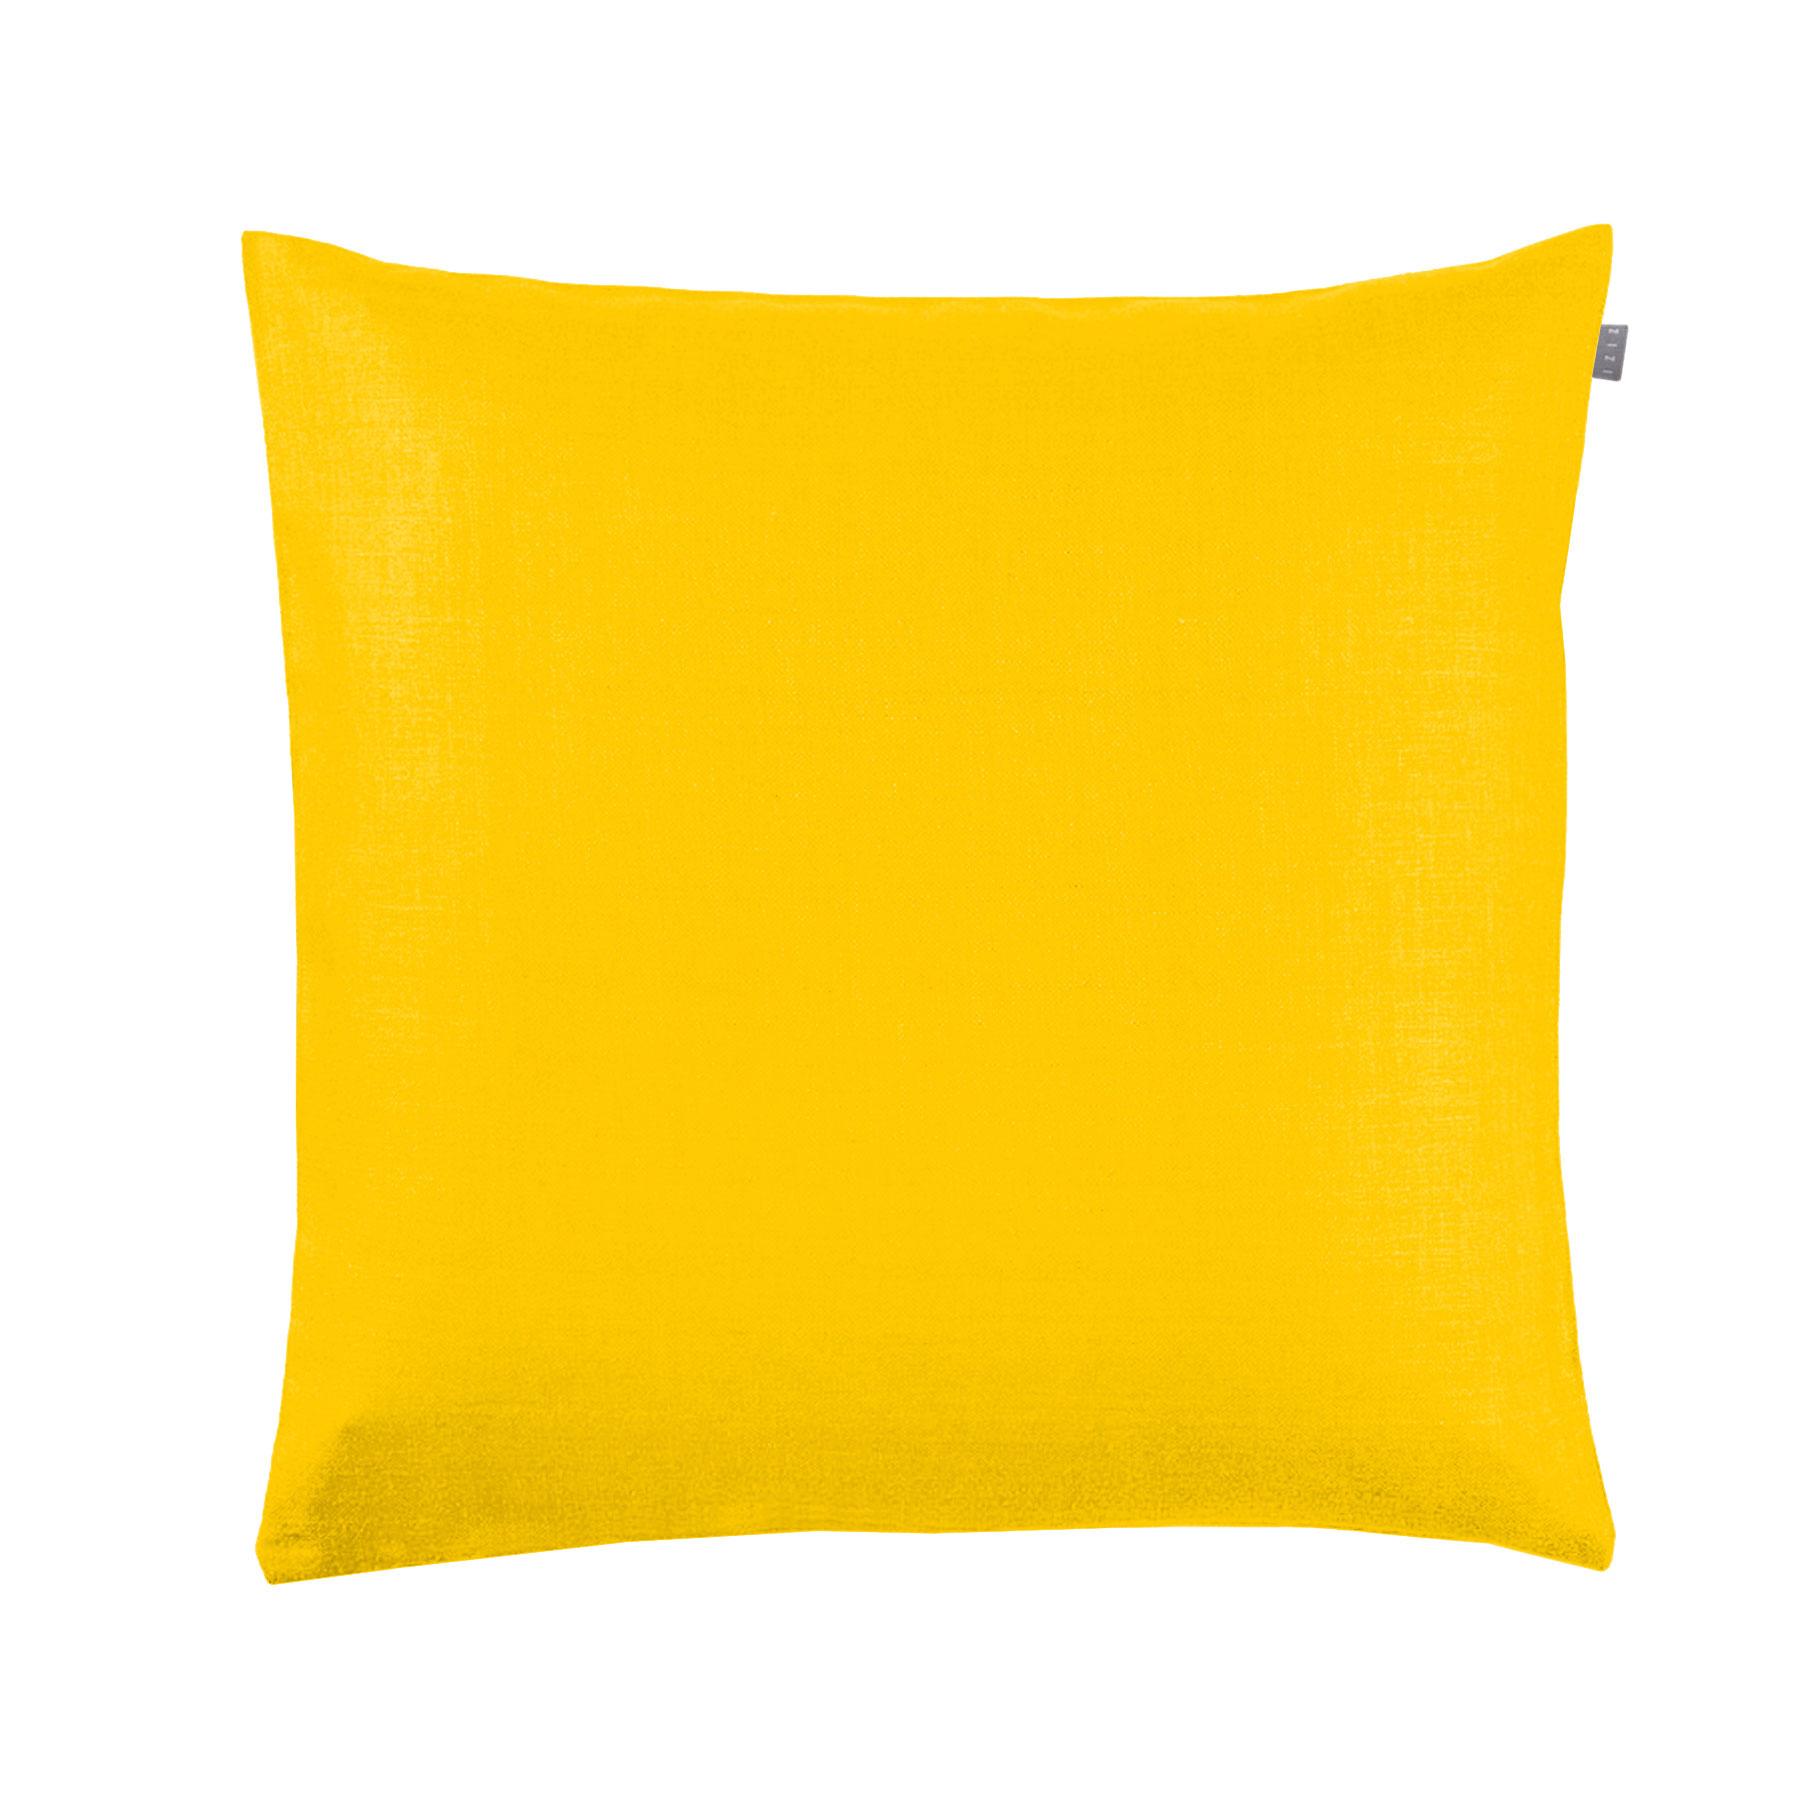 Cushion Cover Plain Yellow Zizi Linen Home Textiles